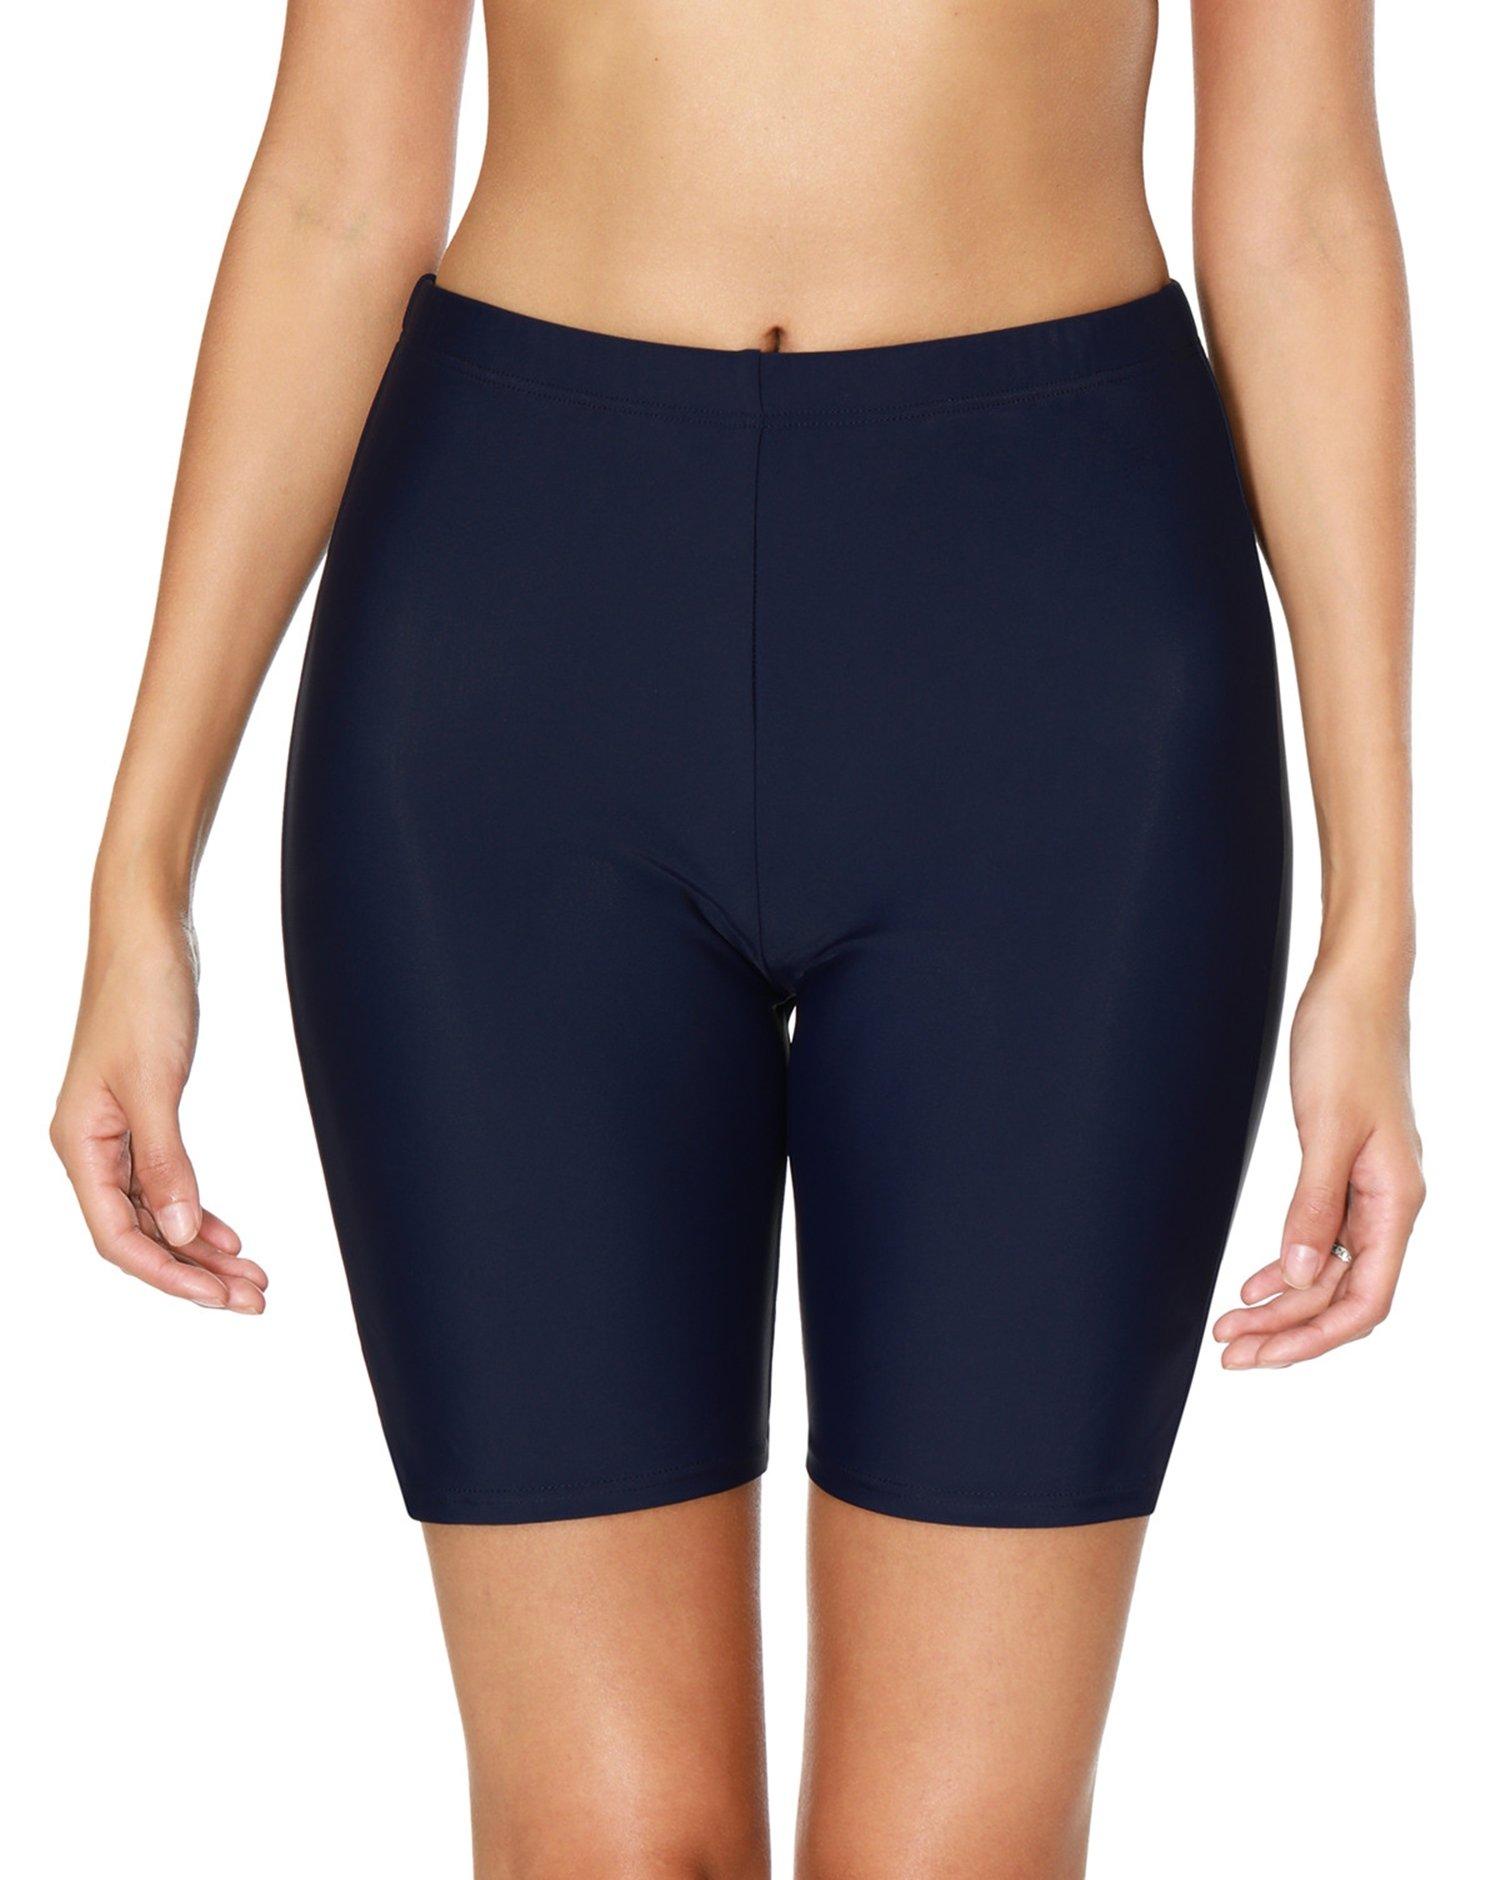 Anwell Women's Tankini Shorts high Waist Long Boyleg Swim Bottom Navy Large